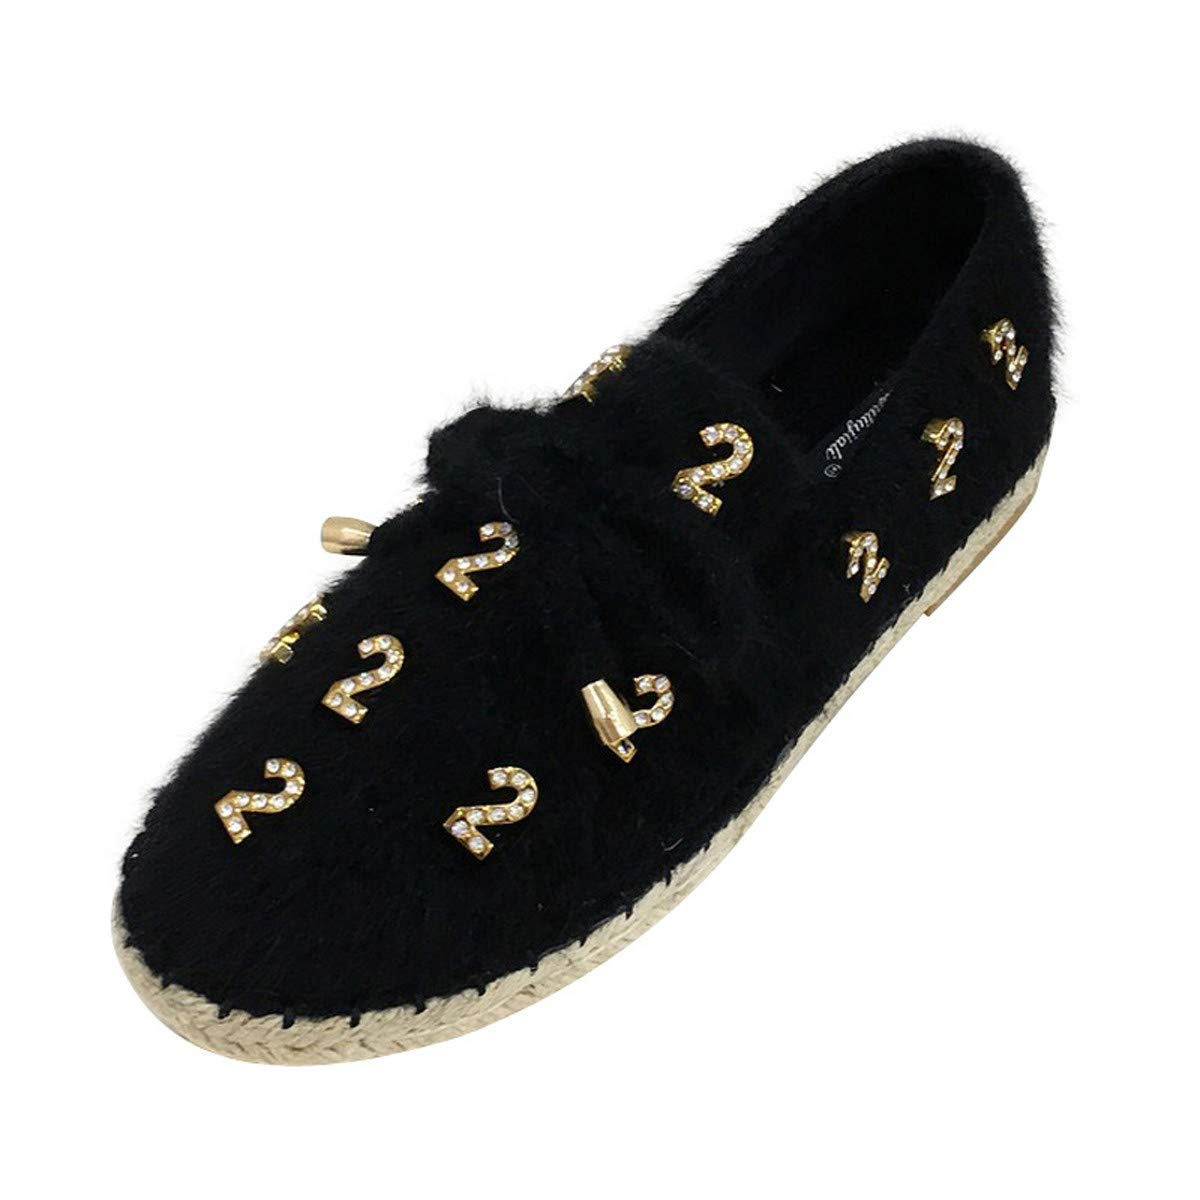 HBDLH Damenschuhe Einzelne Schuhe Runden Kopf Samt Diamond Flachen Boden Faul Schuhe Schwarz 39